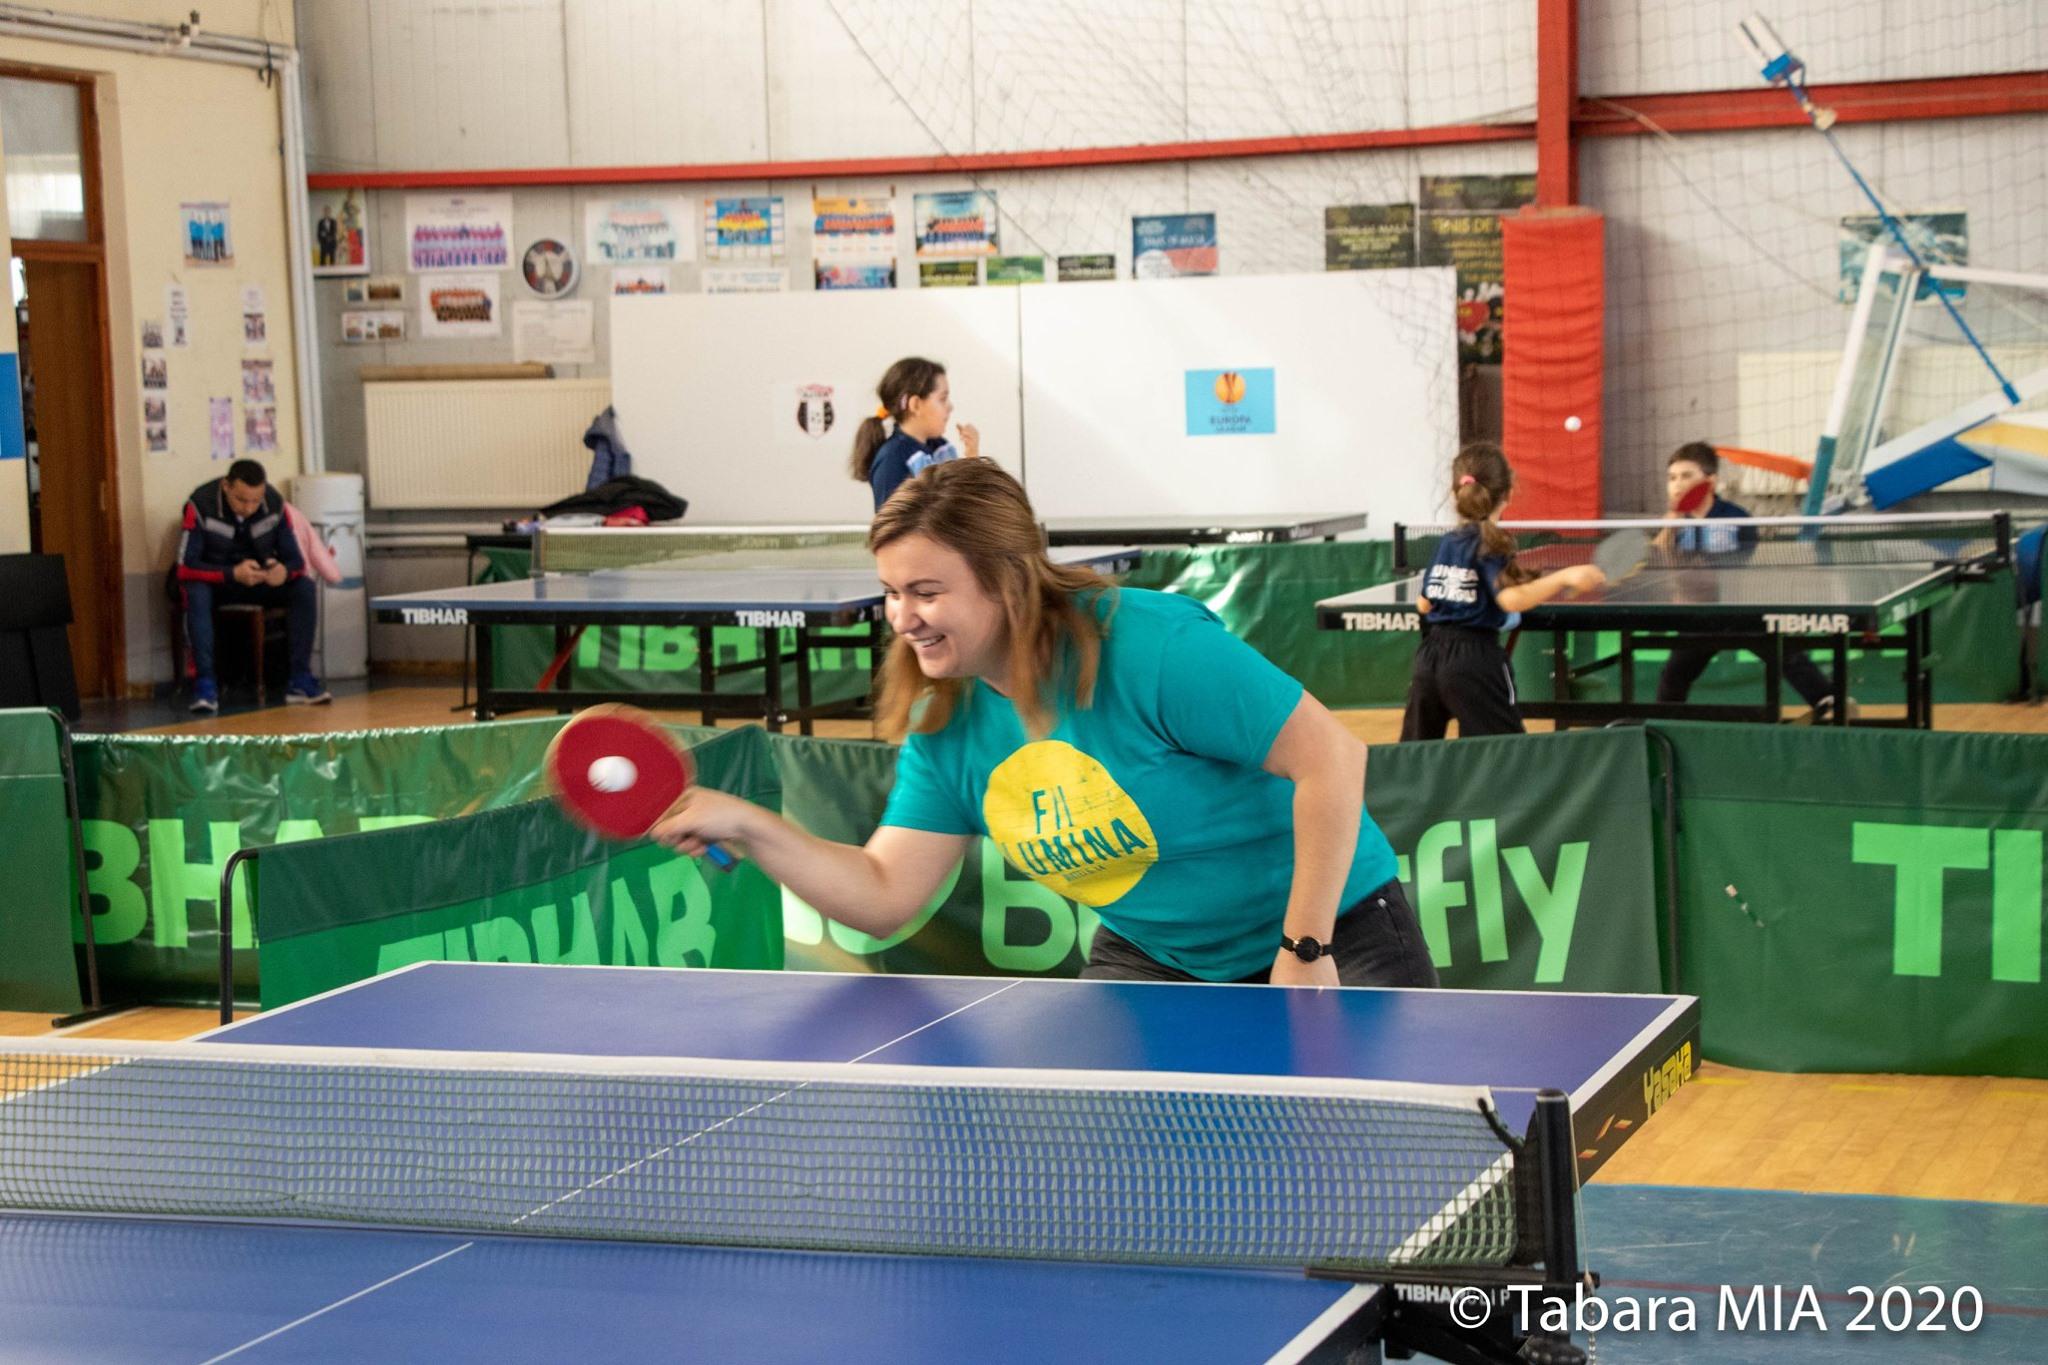 turnee sportive ping pong